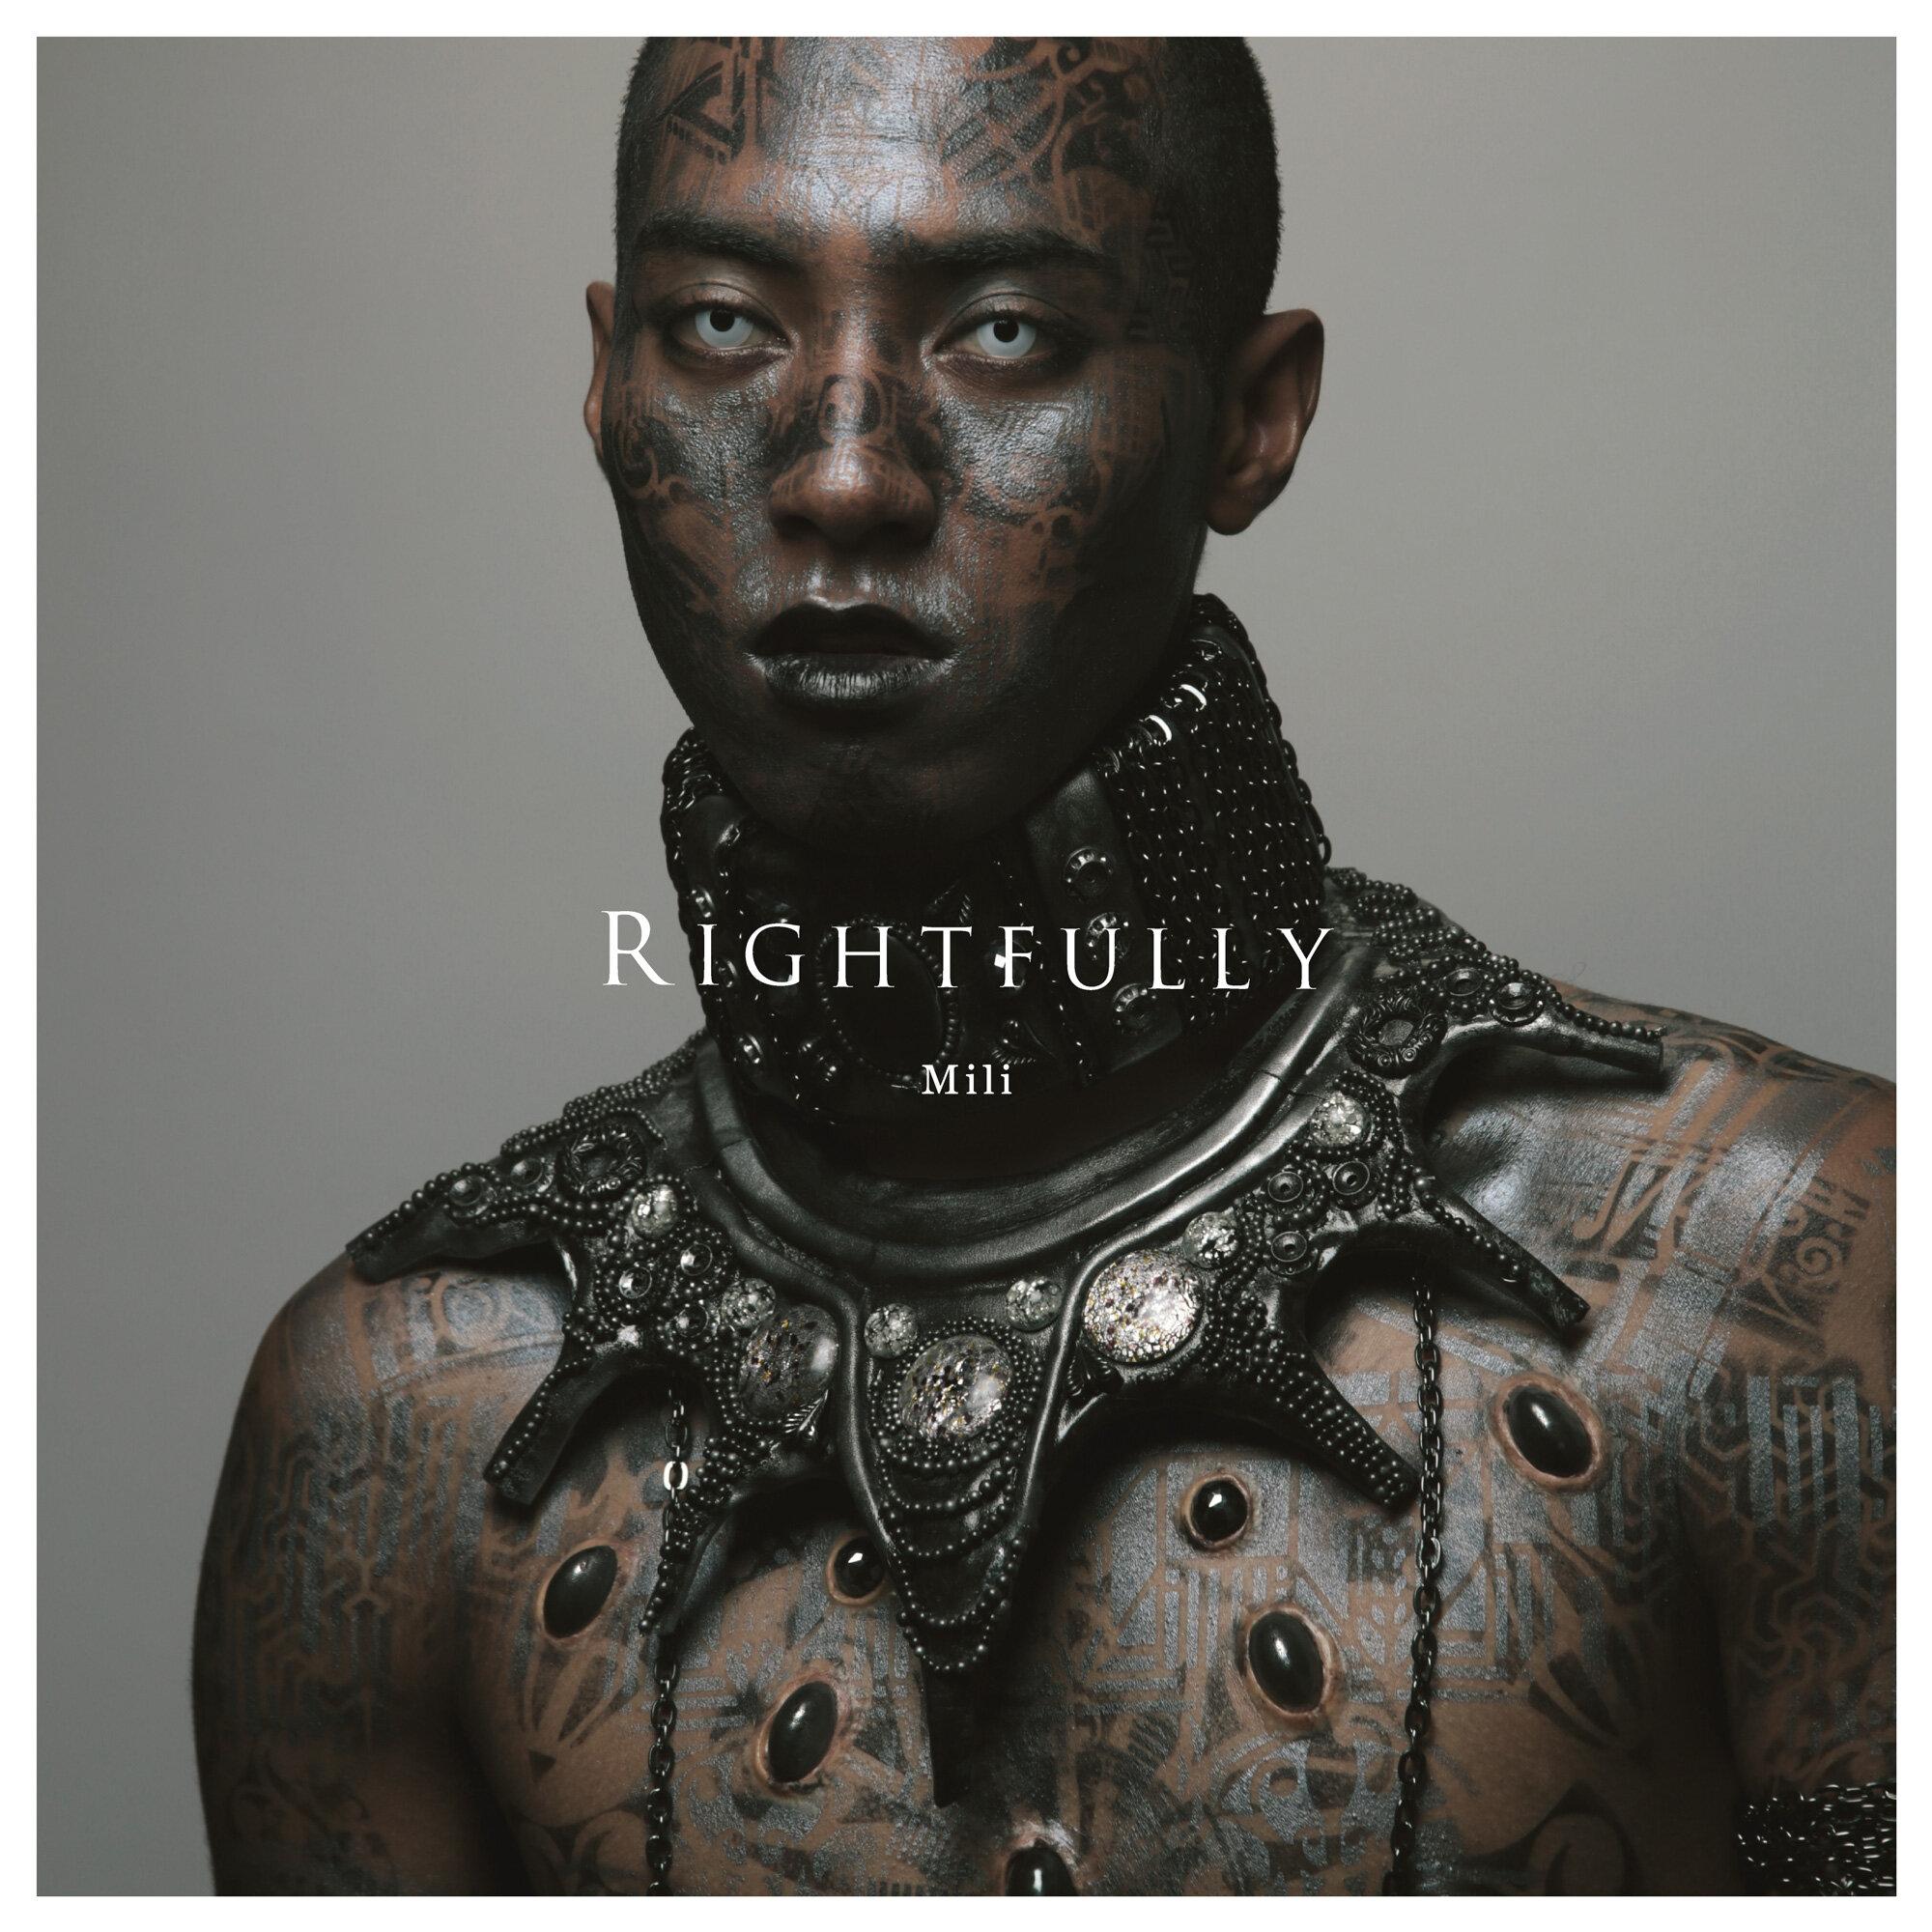 Rightfully+(Miliスペシャルパッケージ)(CD+LiveDVD&moer).jpg